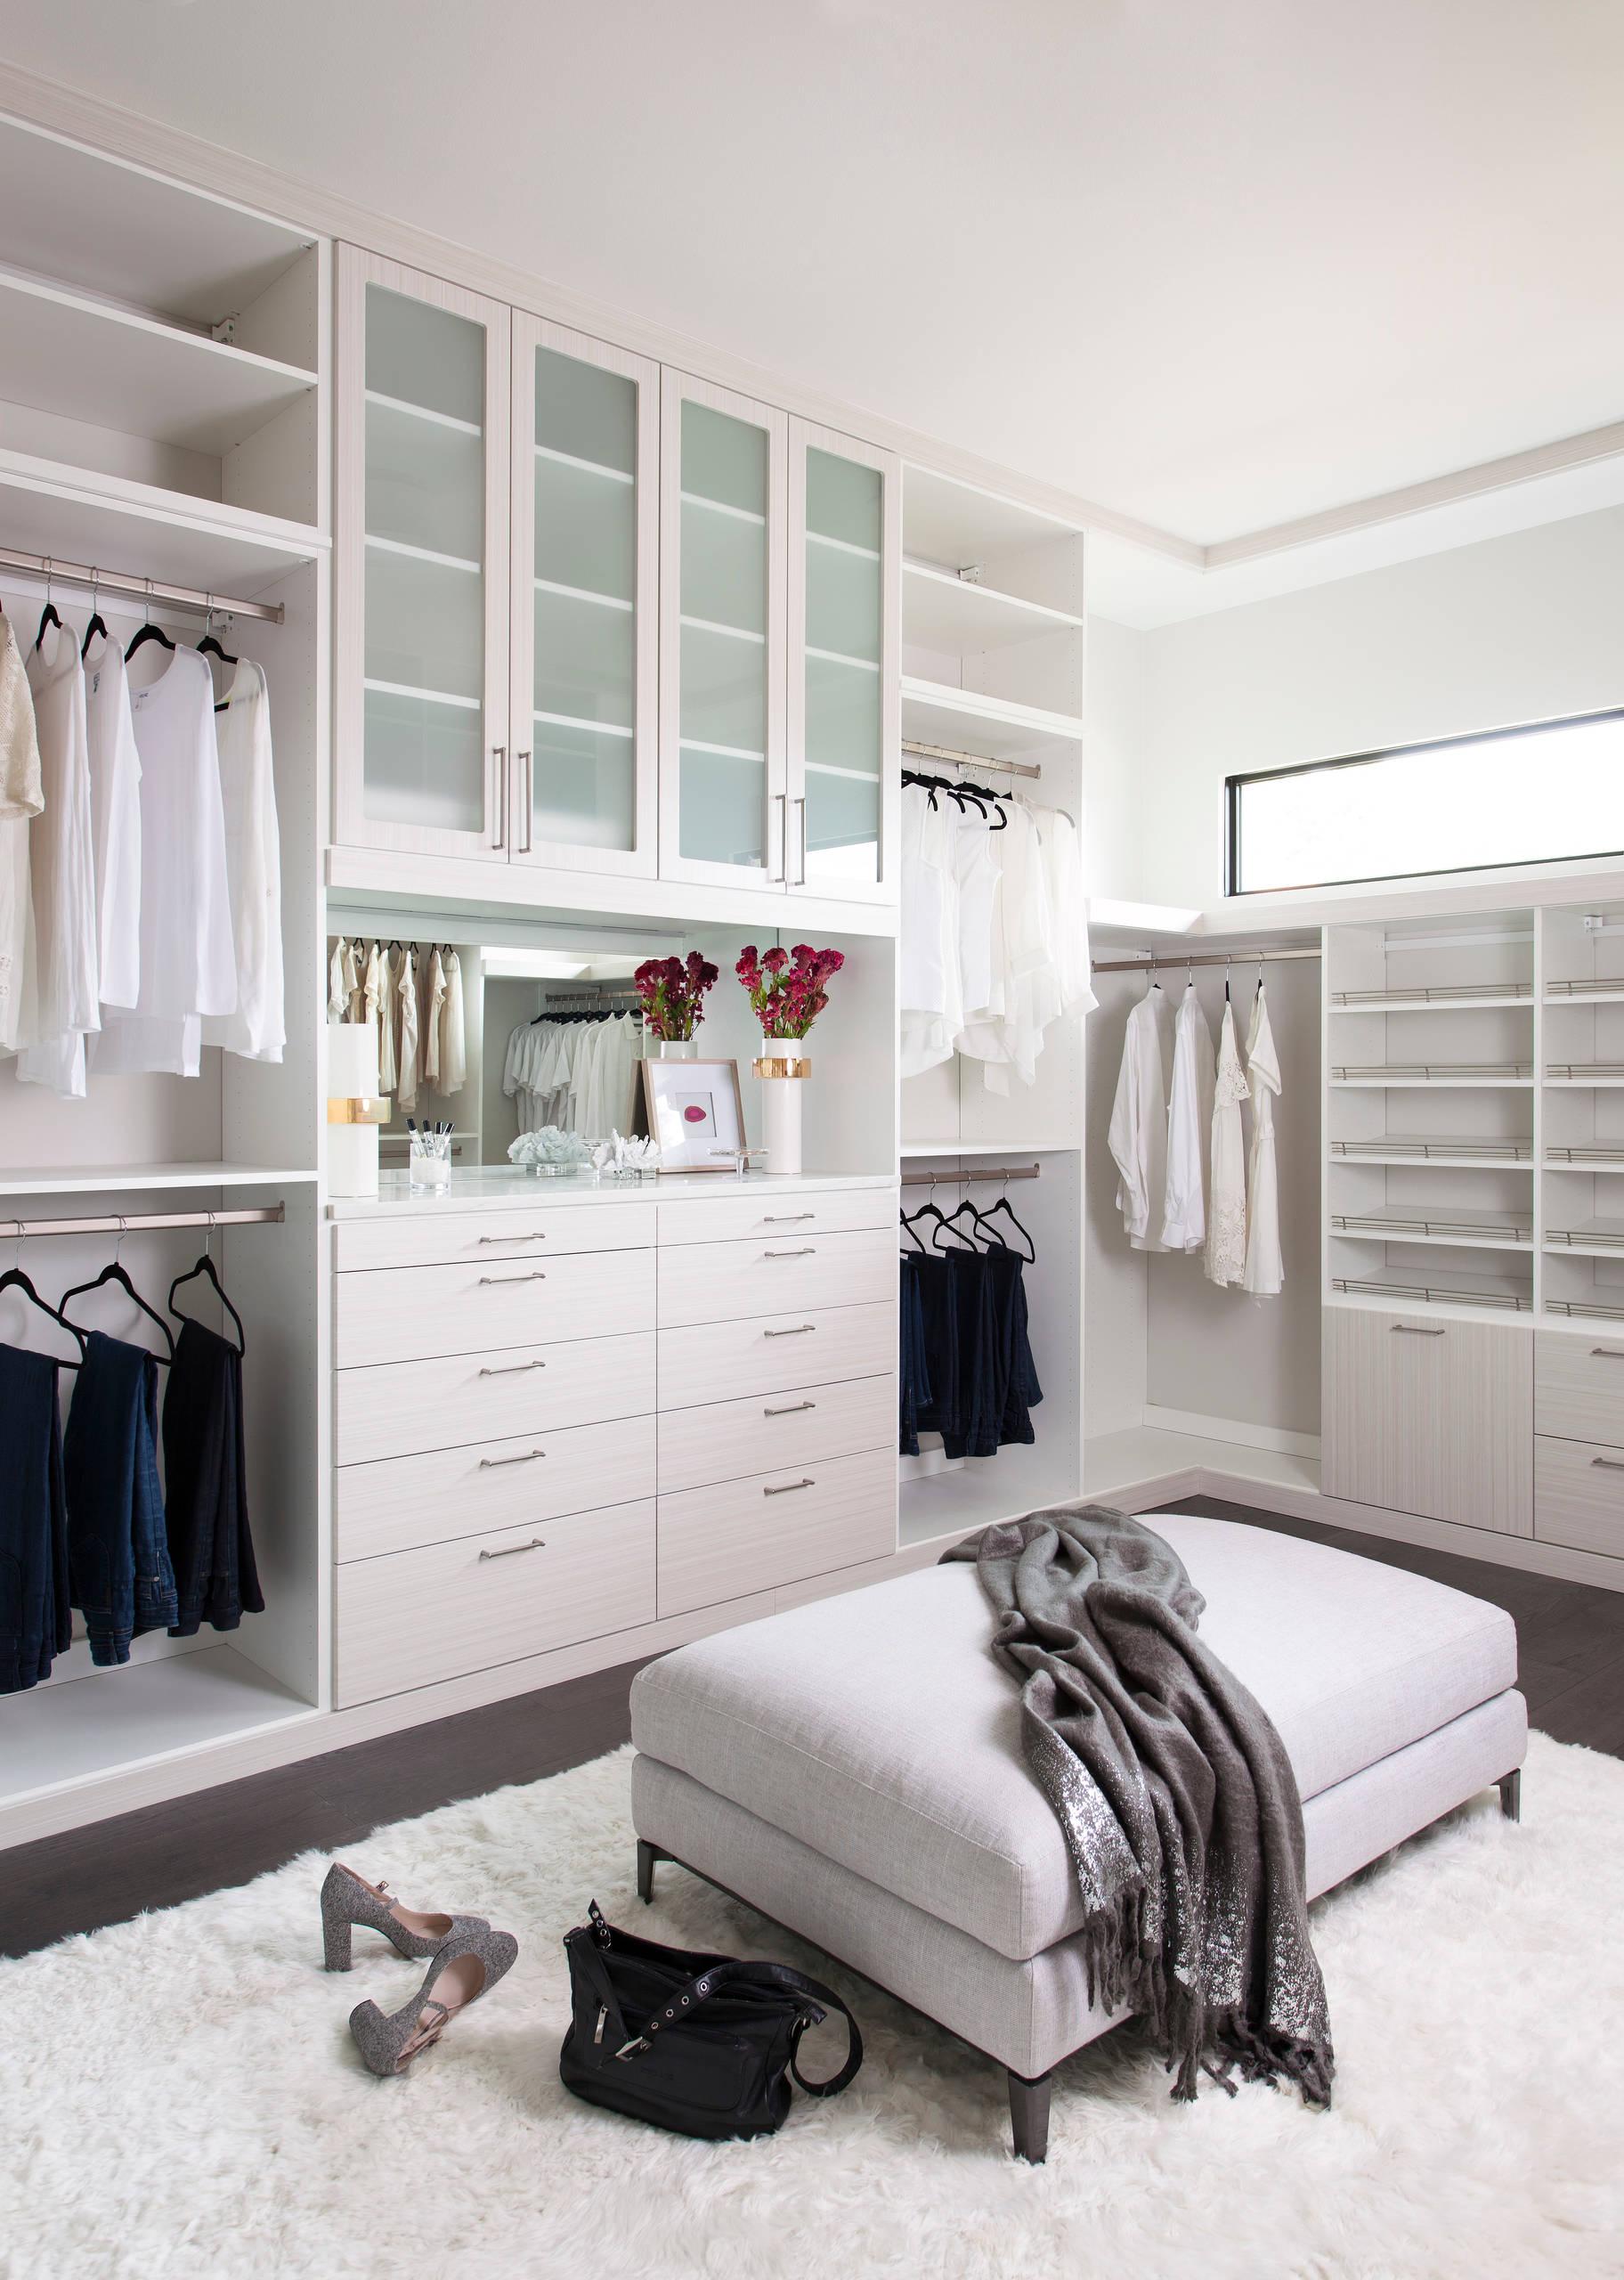 75 Beautiful Women S Closet Pictures Ideas November 2020 Houzz